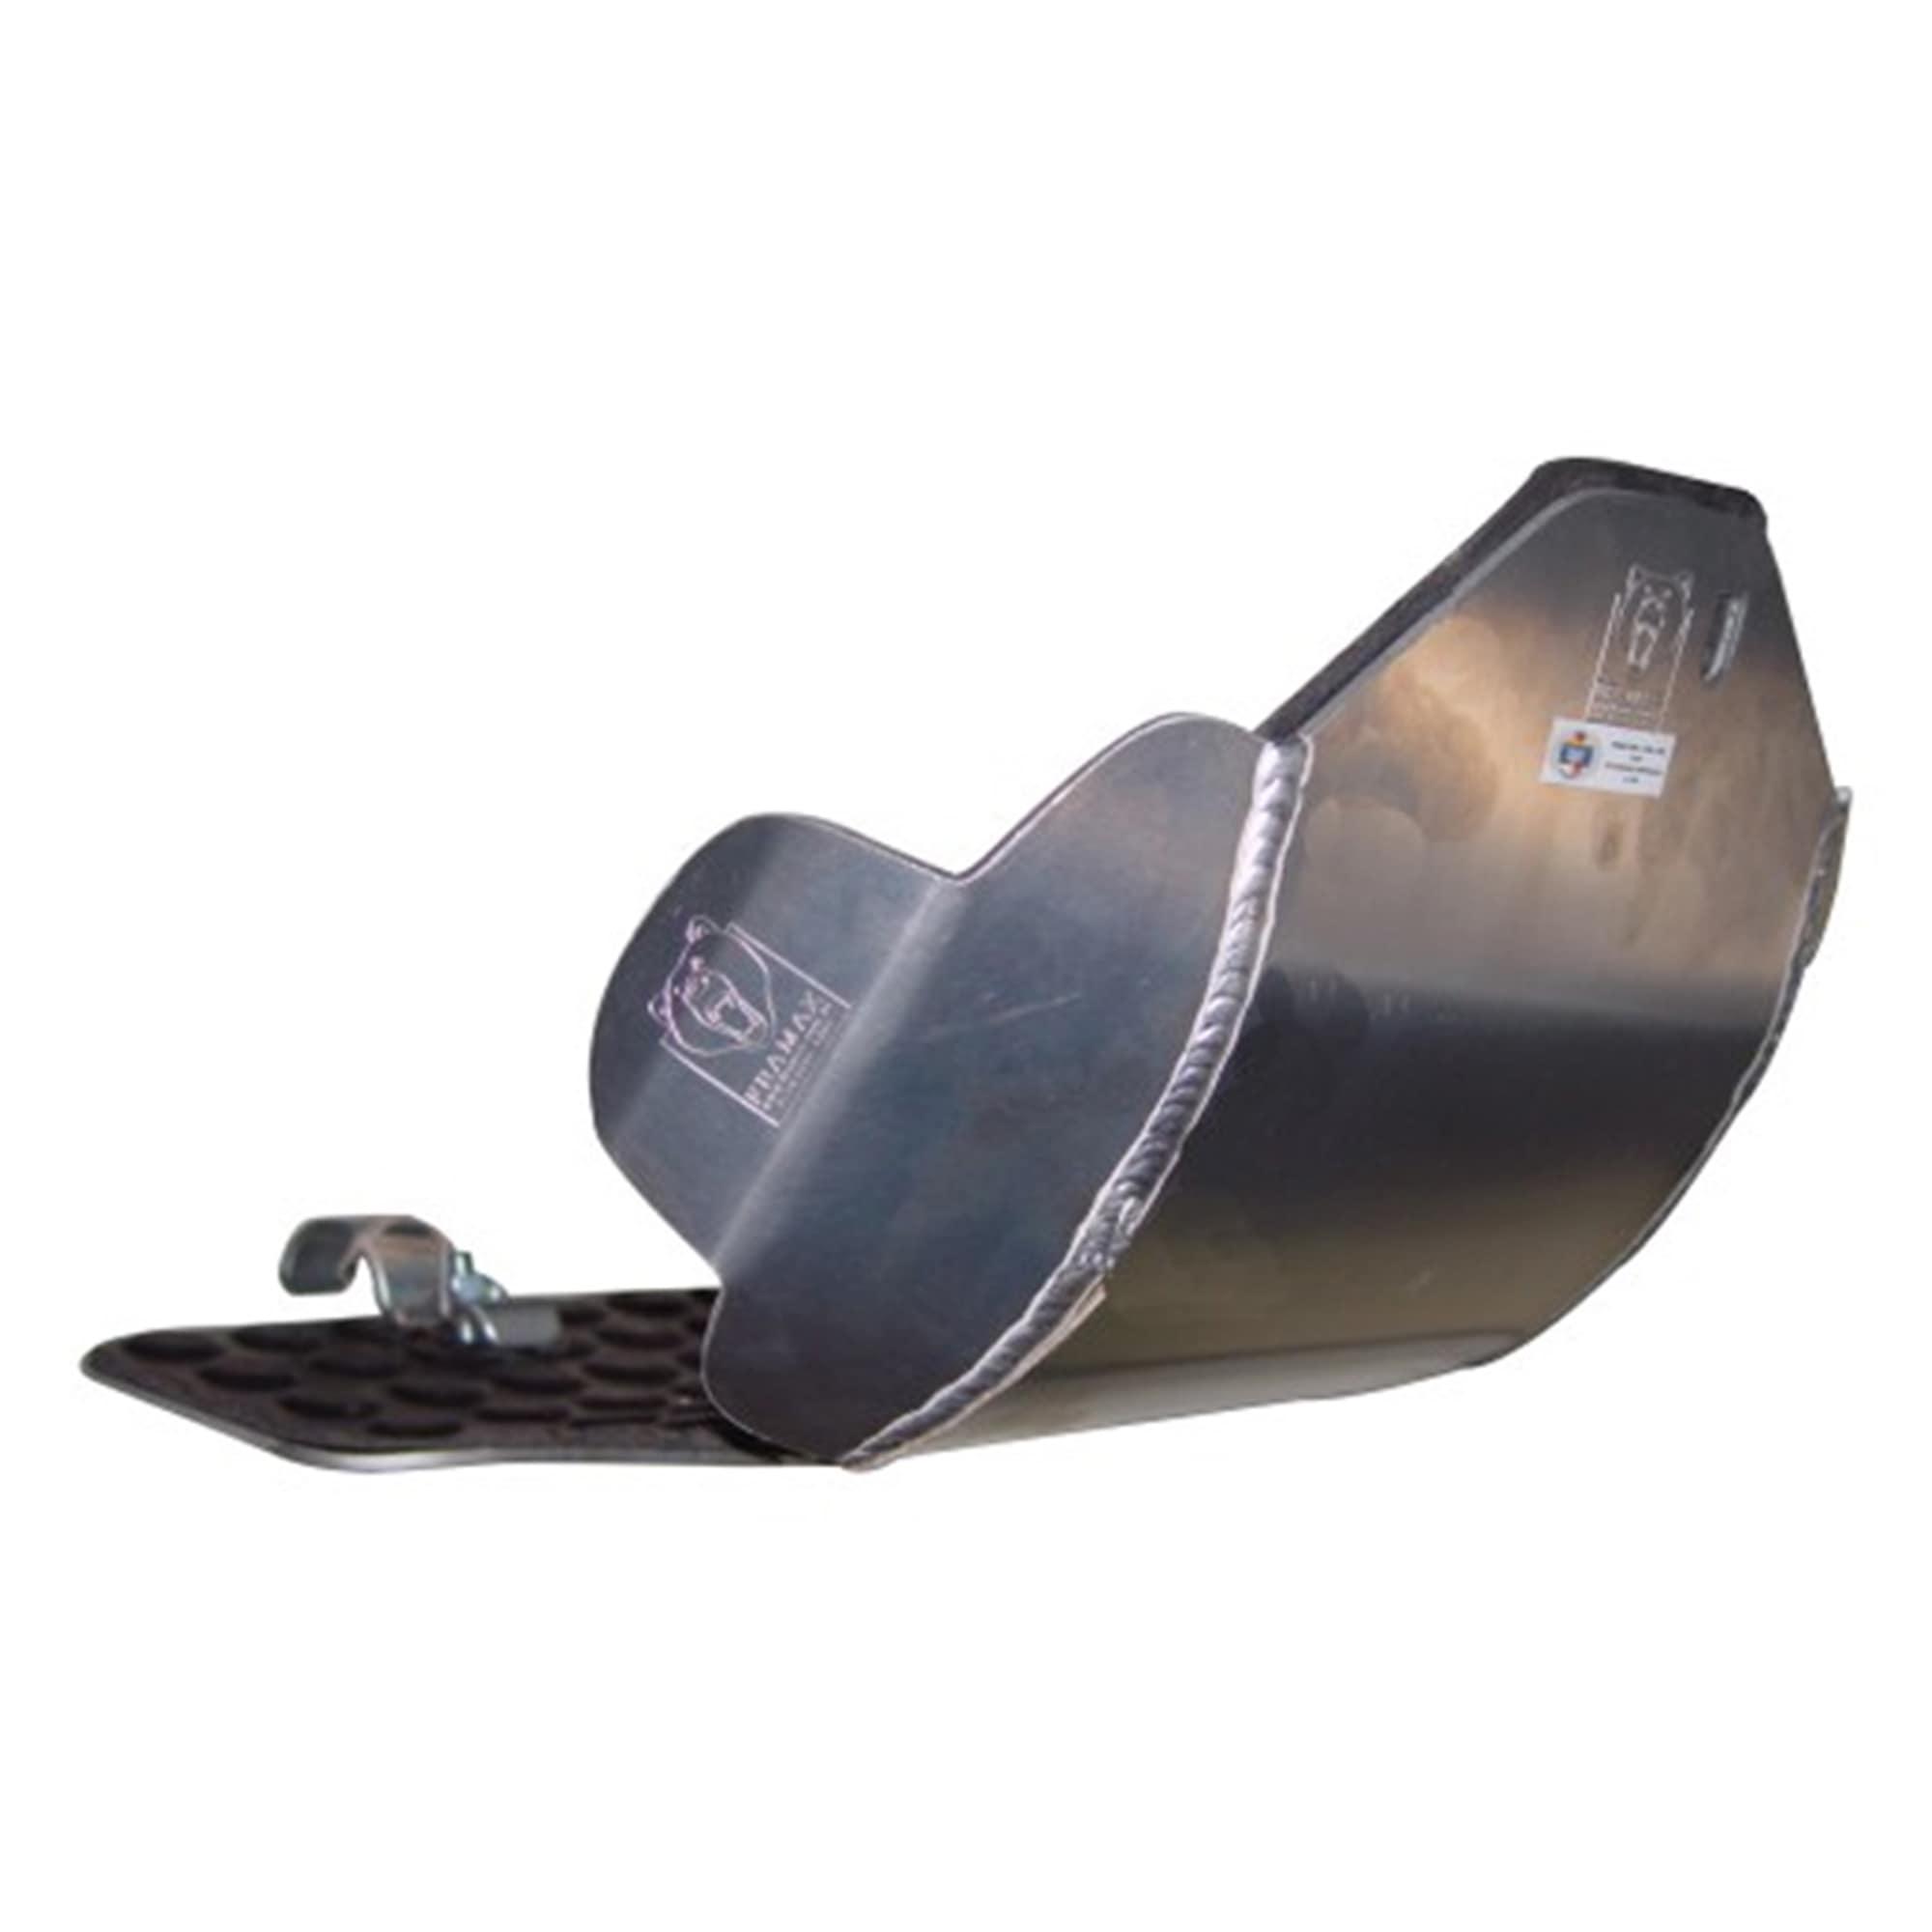 Protetor de Motor Framax WRF 250 04/06 (Alumínio)  - HP Race Off Road